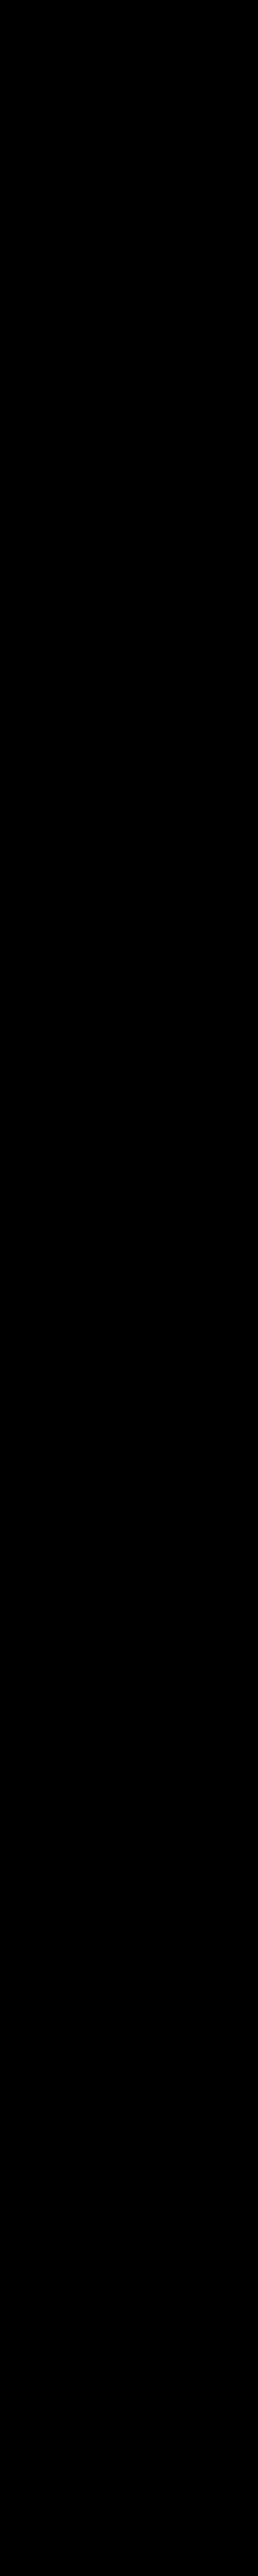 SolidBlack 350x3500